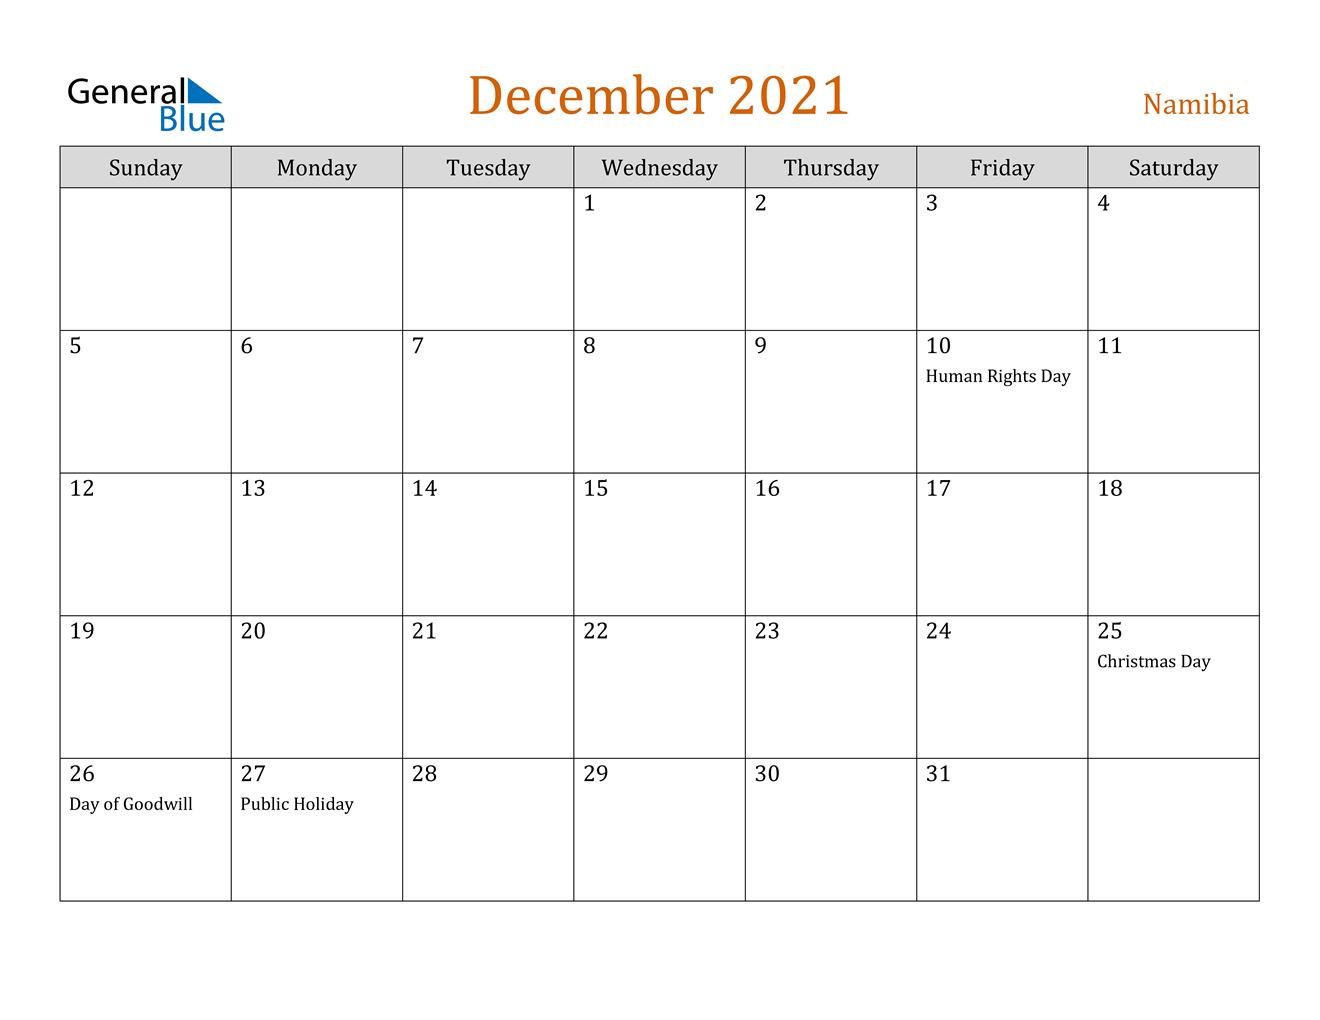 December 2021 Calendar - Namibia